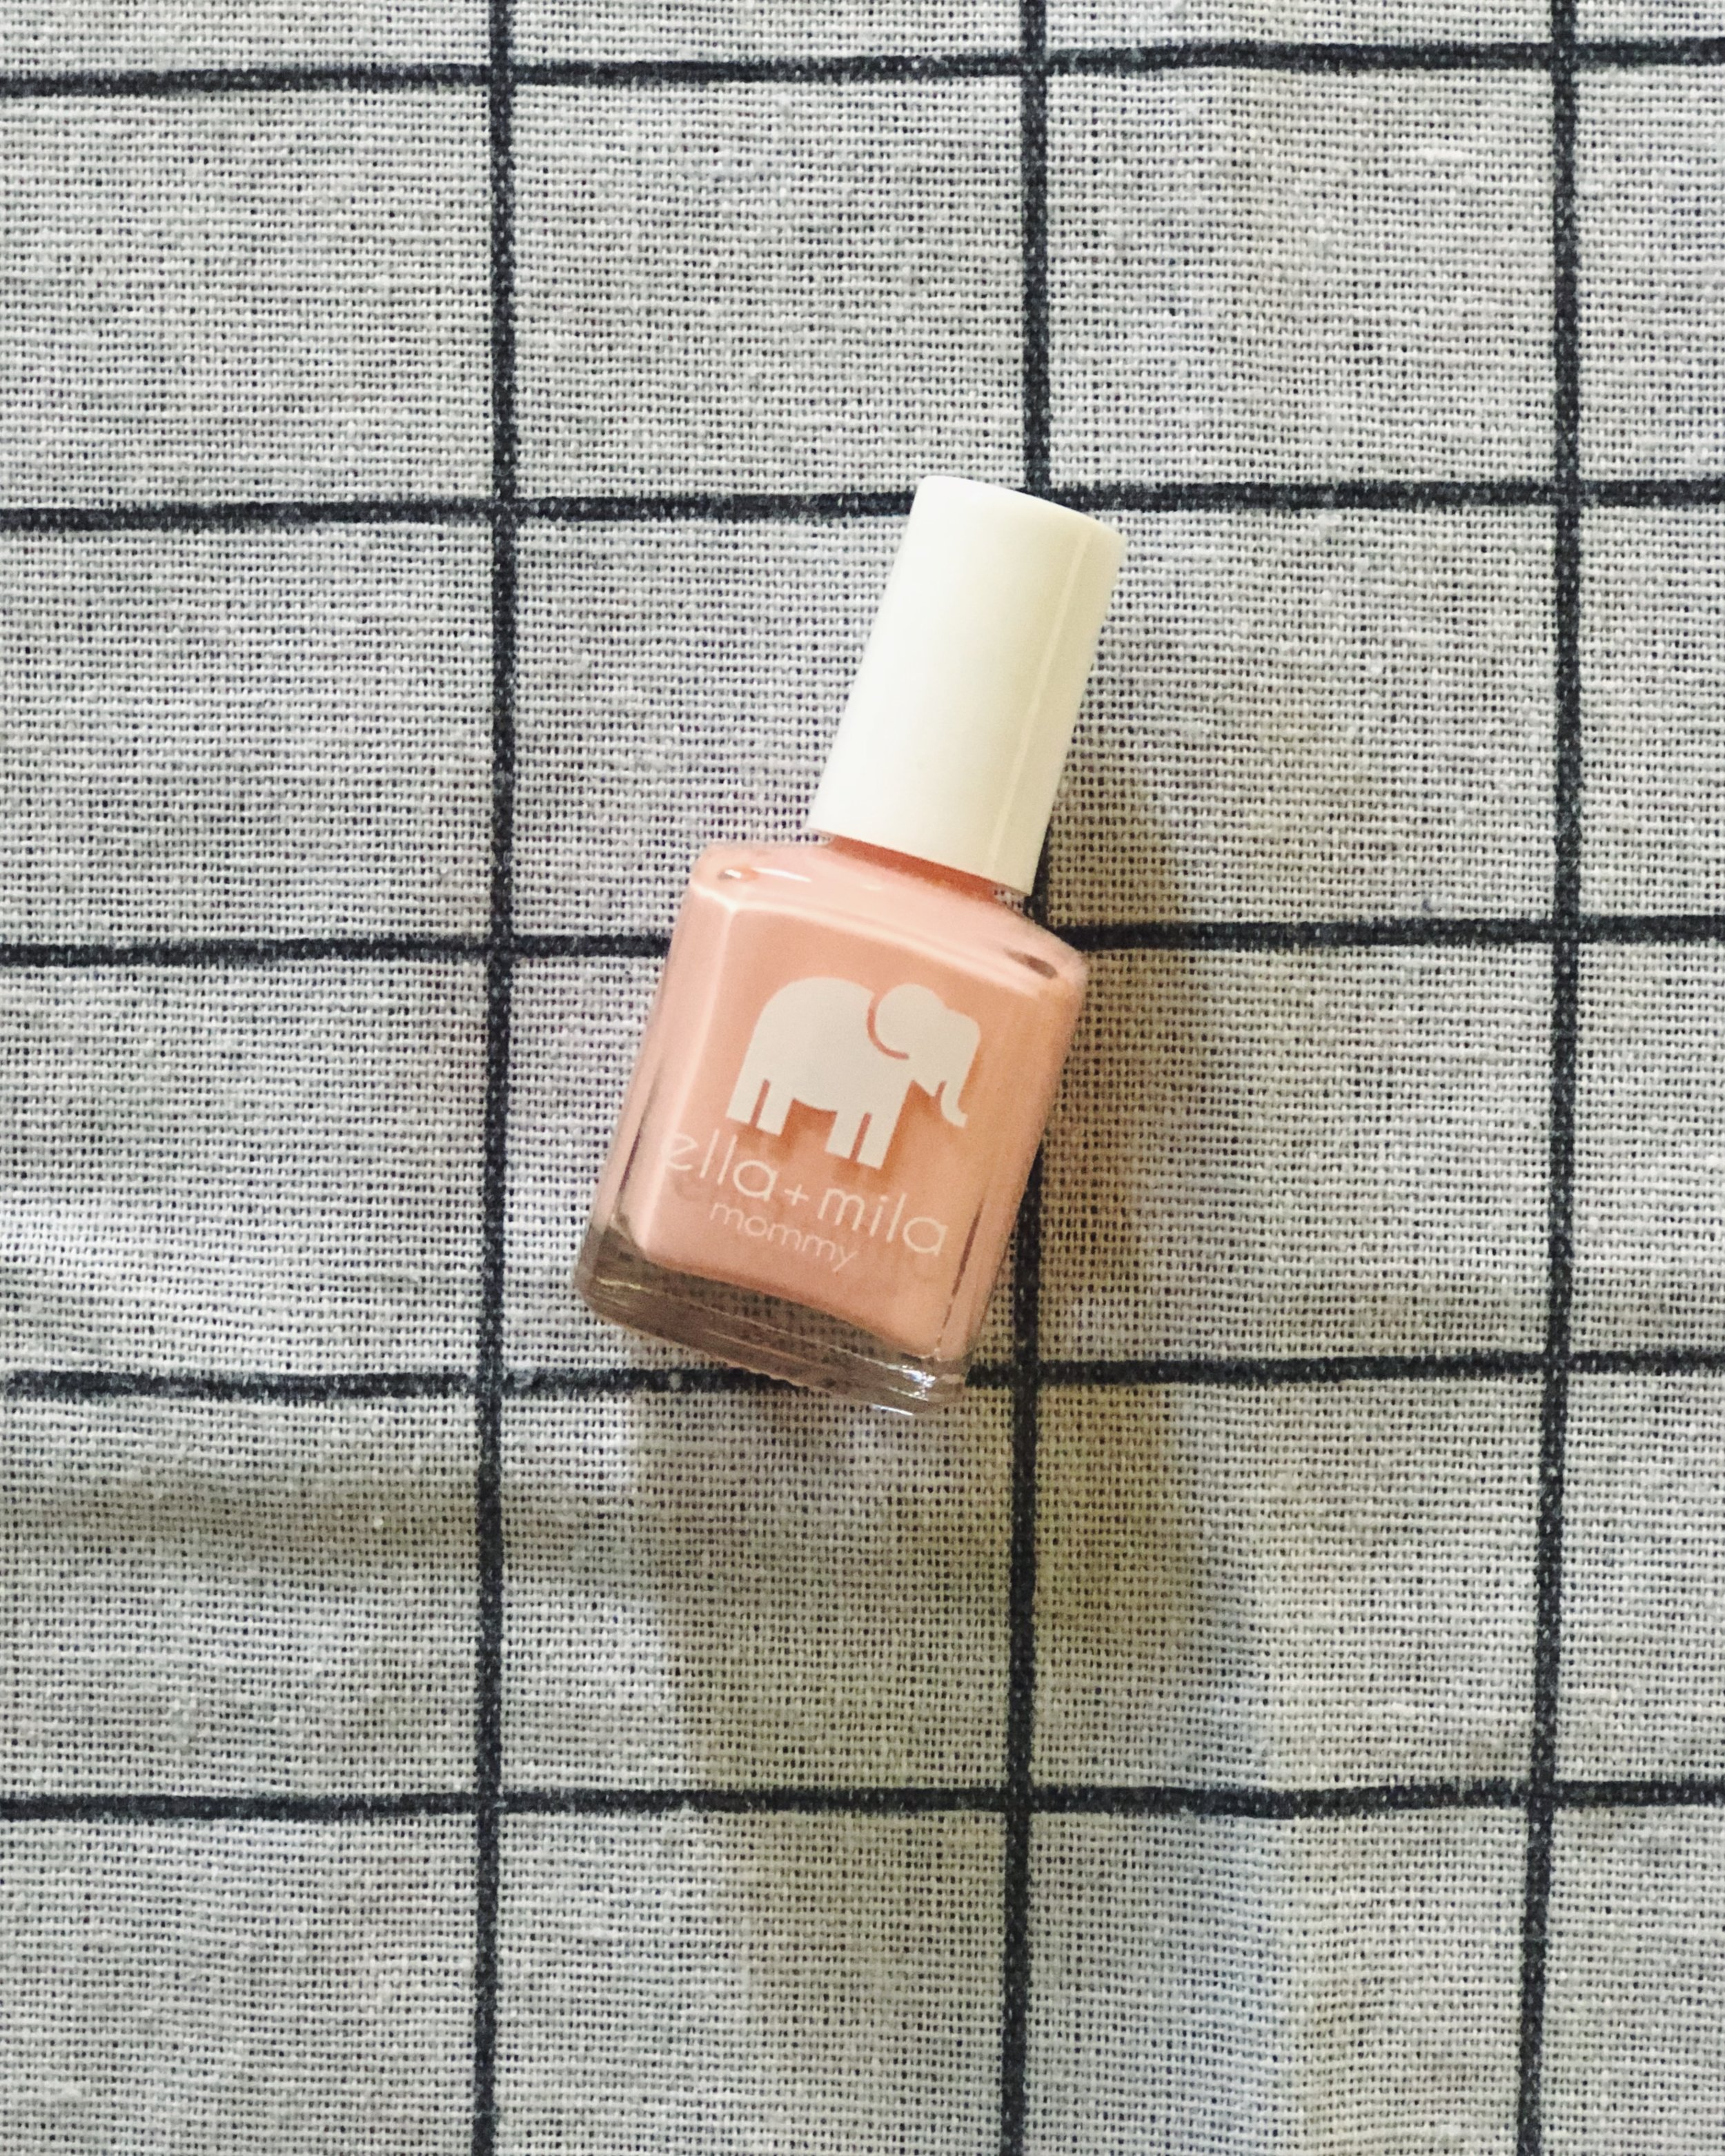 ella & mila tea rose nail polish